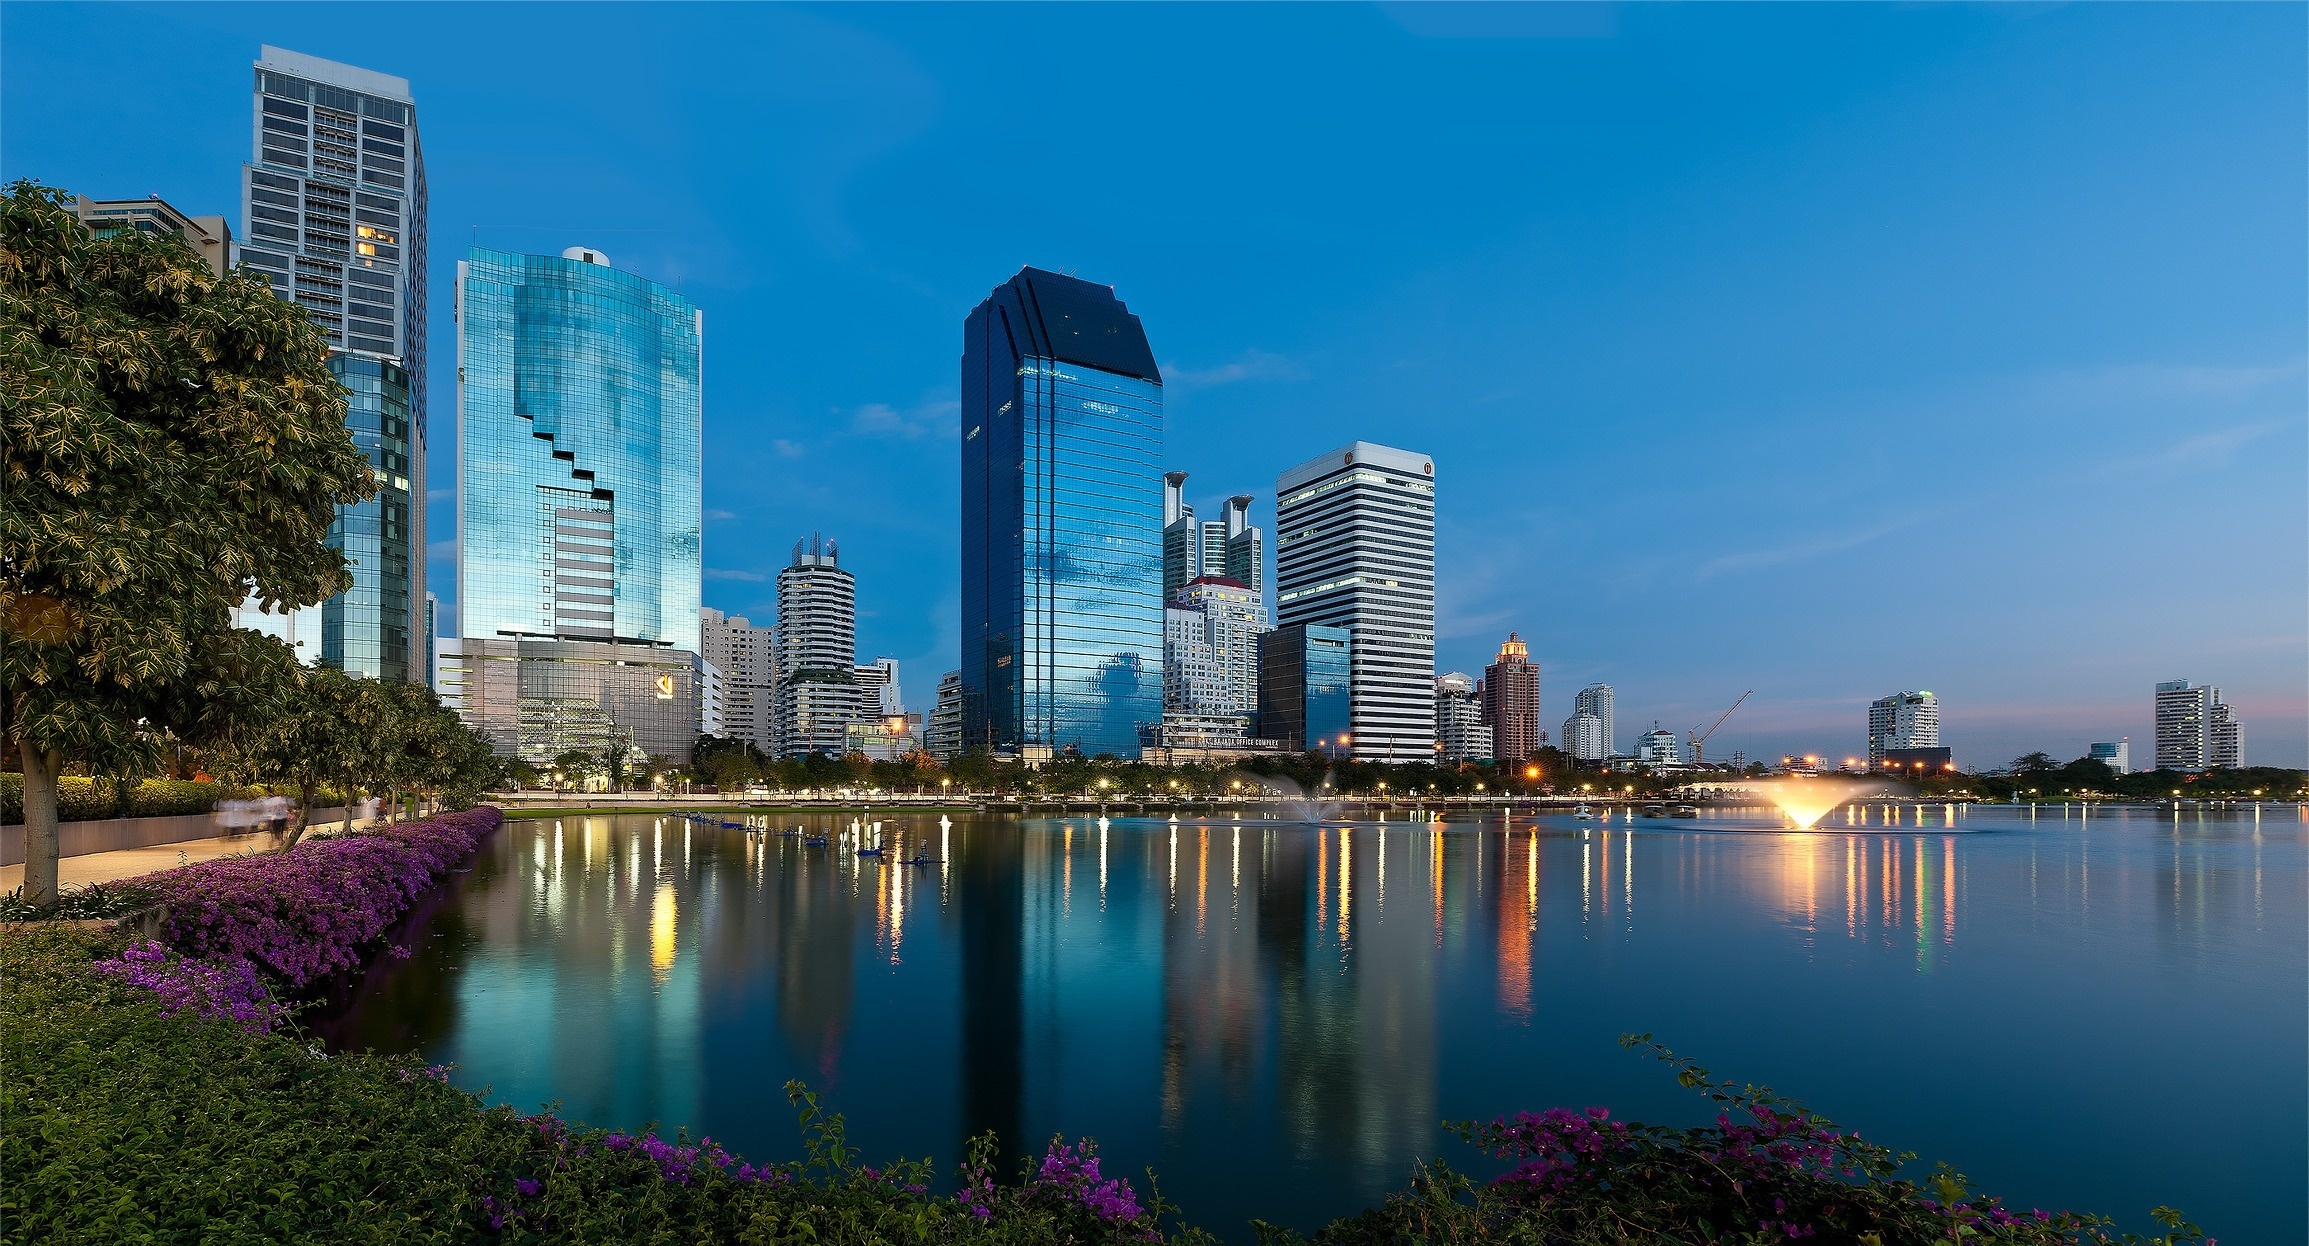 страны архитектура Бангкок Таиланд ночь  № 2195084 без смс